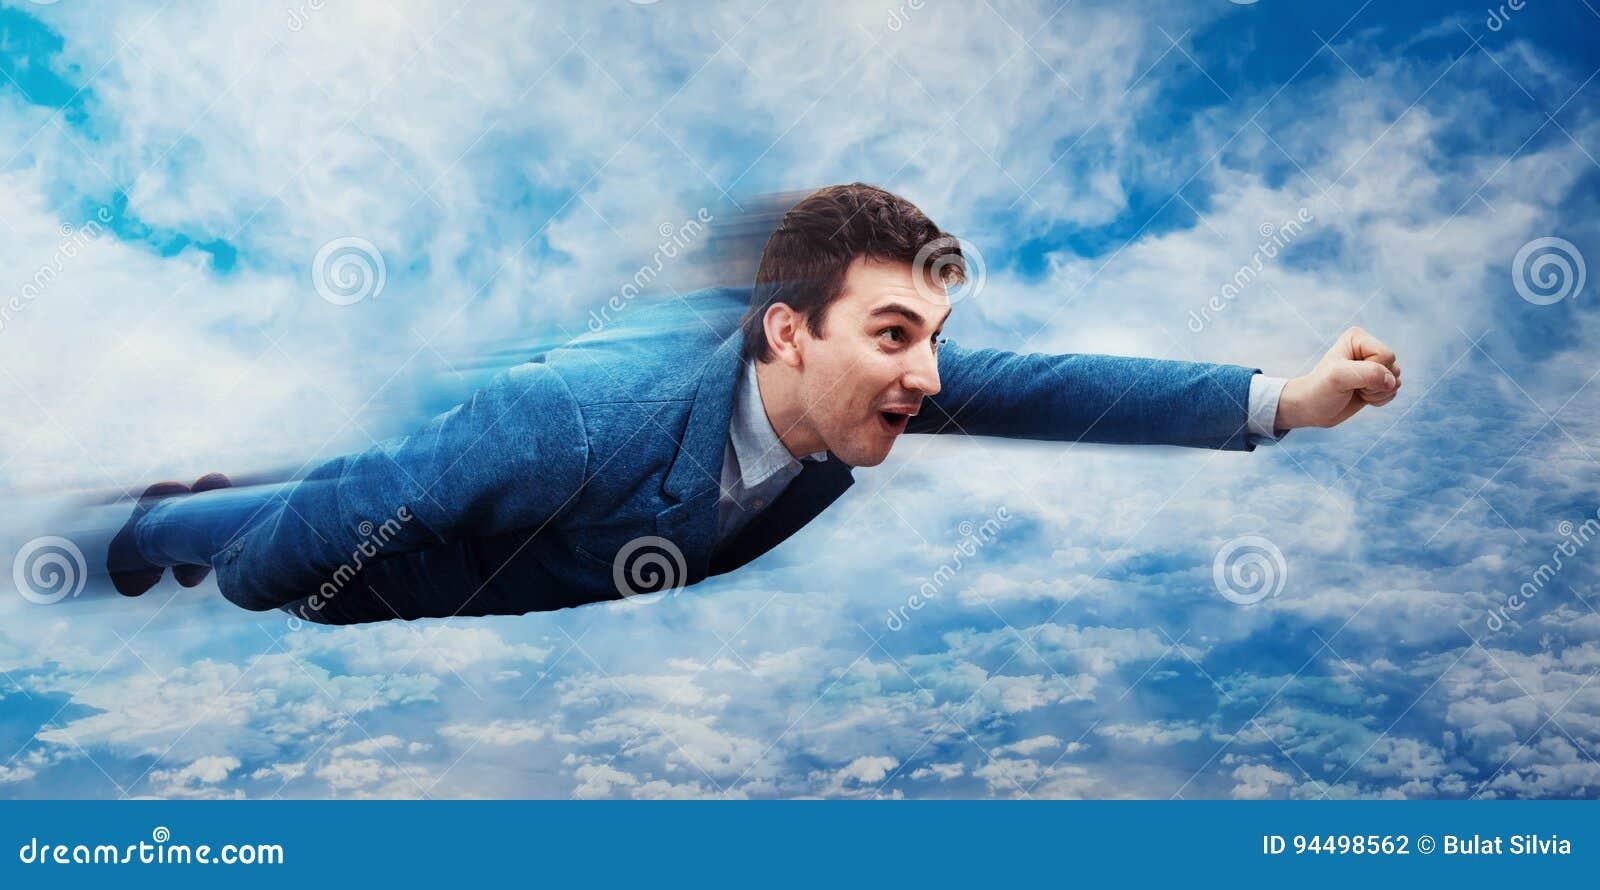 Businessman flying like a superhero